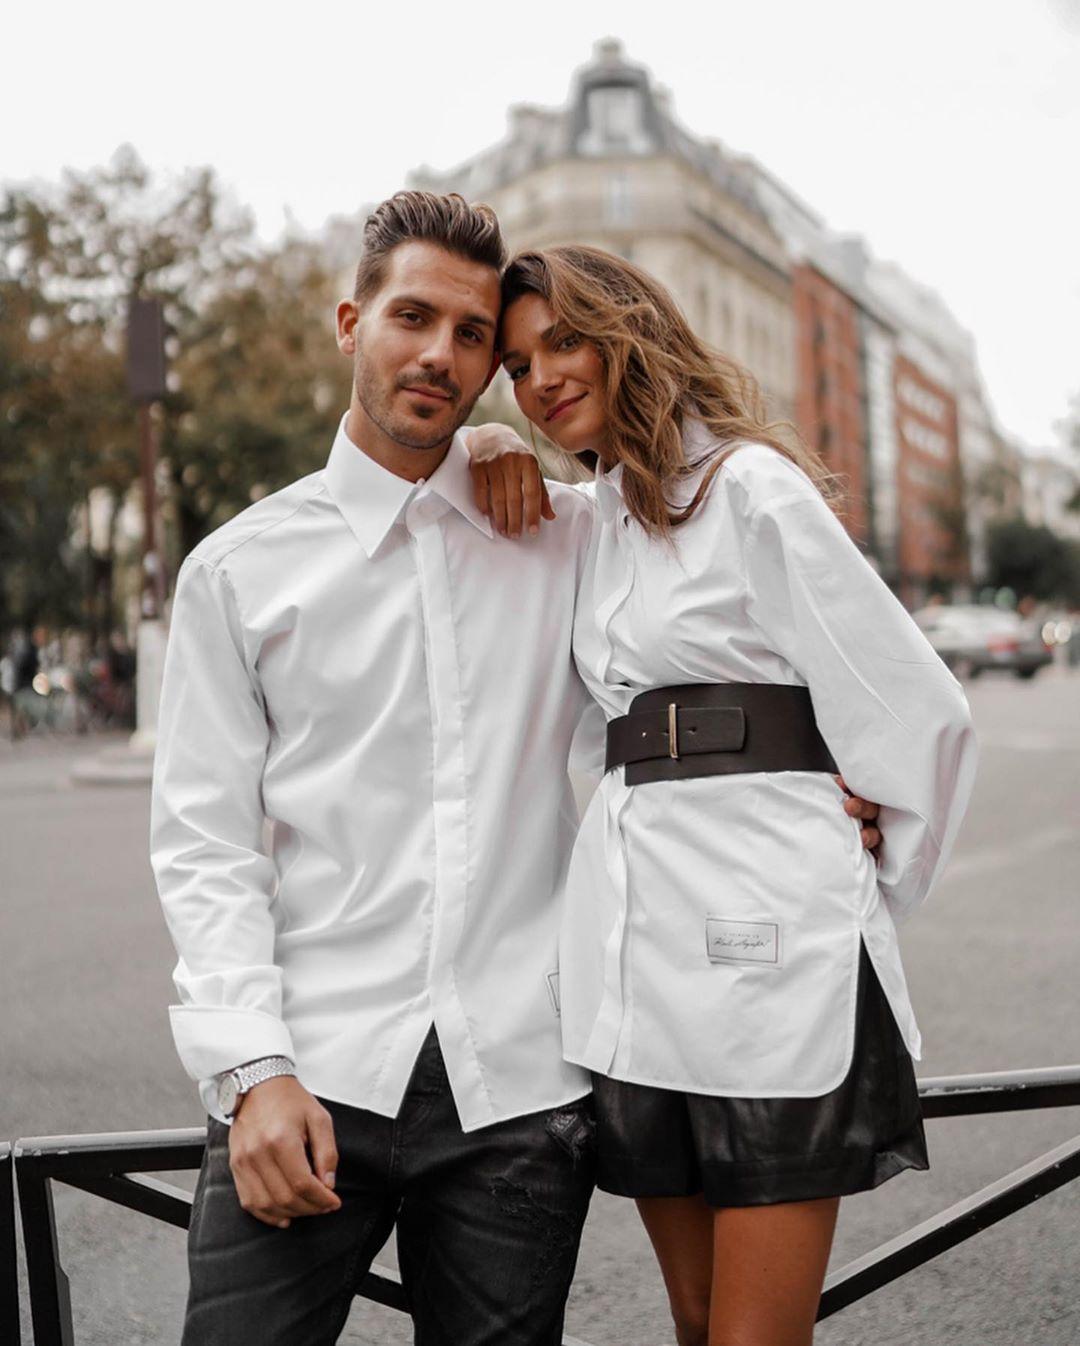 ceinture type ceinture chinoise de Zara sur junesixtyfive